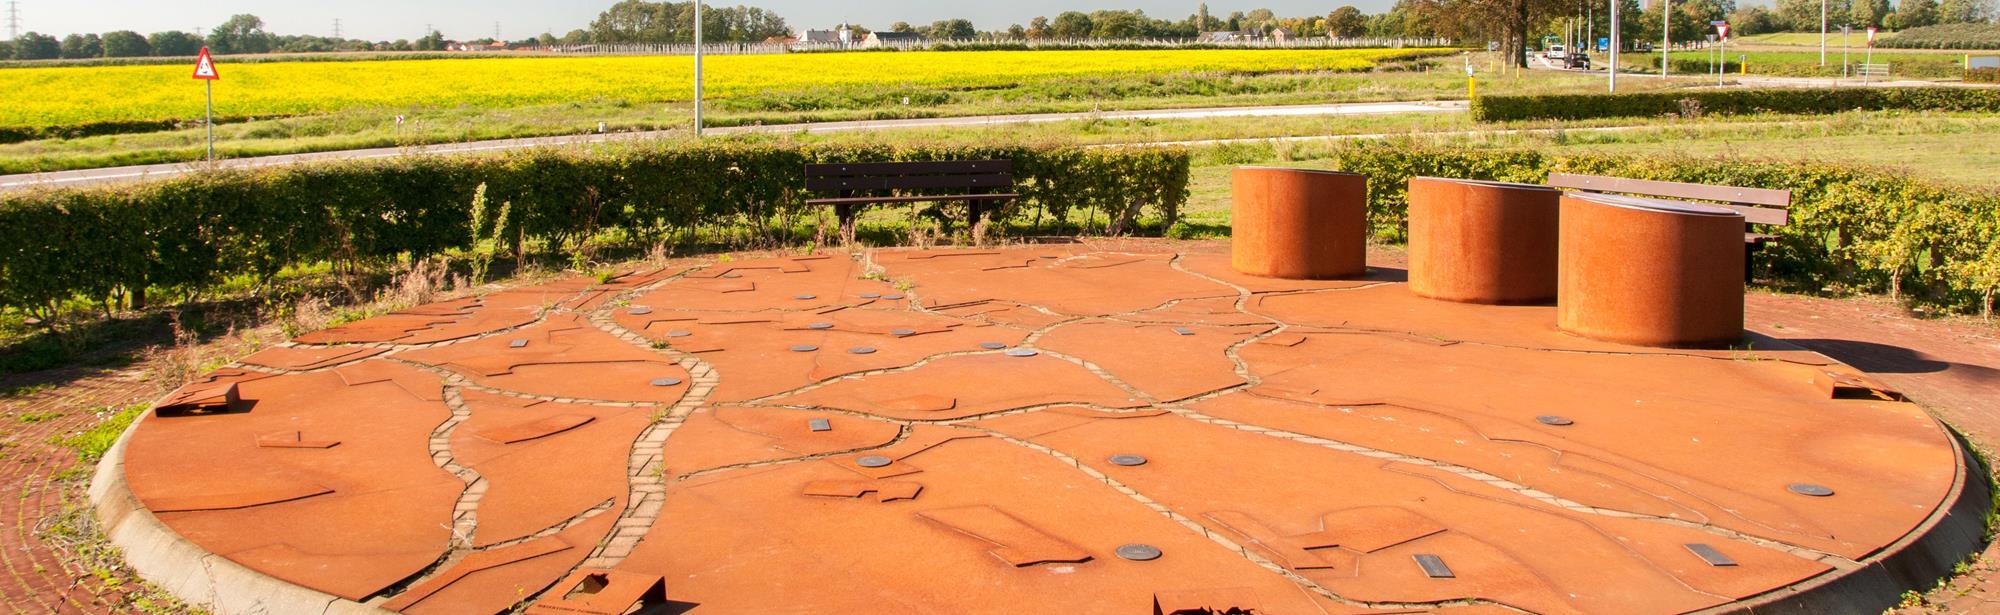 Archeologisch rustpunt Steenland